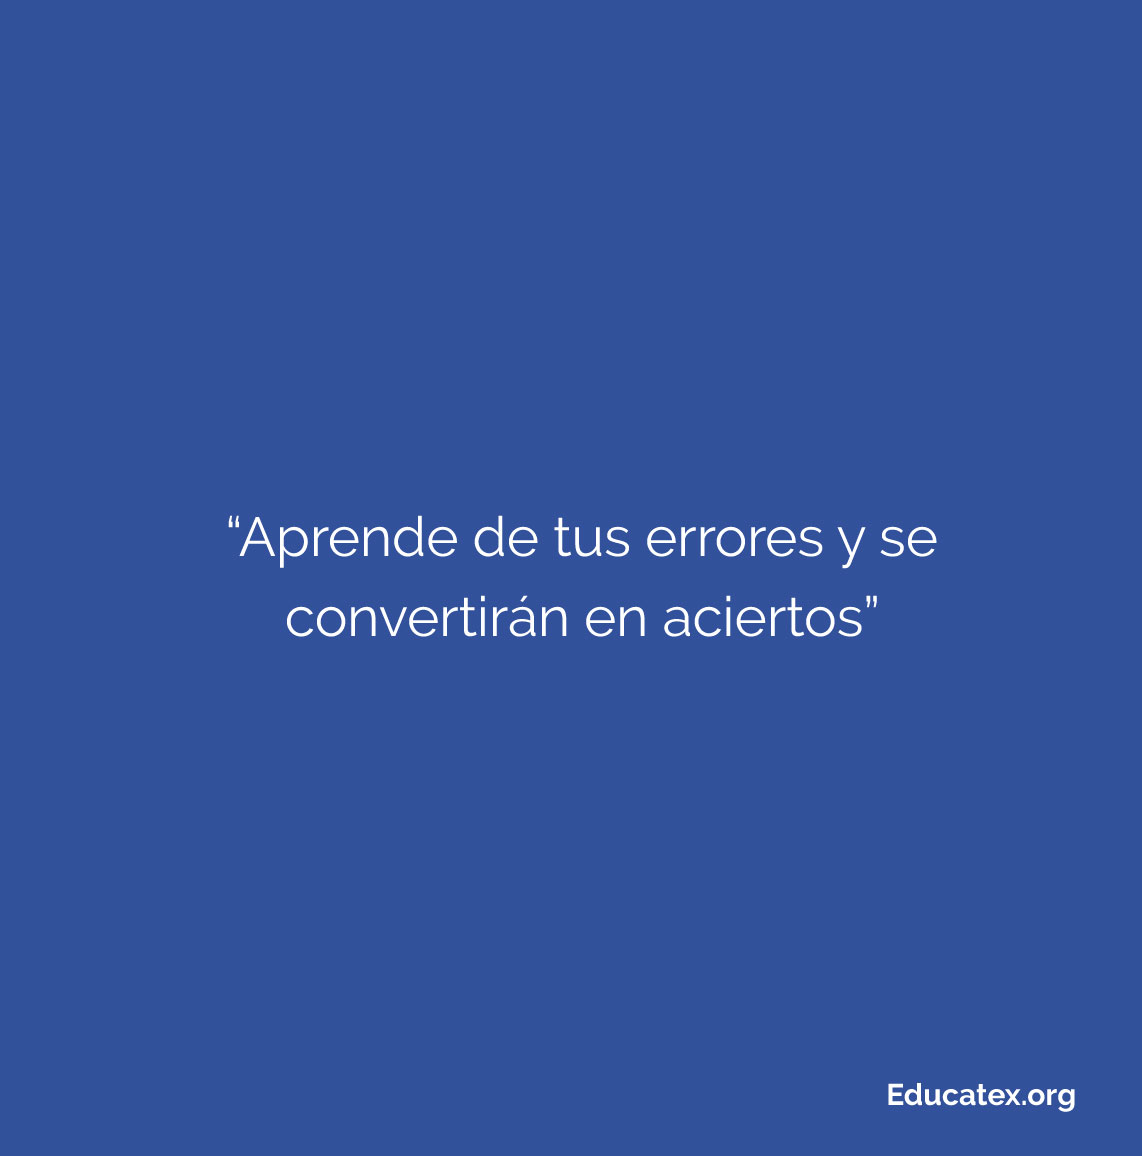 Frase del día . Para más conocimiento util @educate.x⠀ . #educatex #curiosidades #curiosidadesnerds #curiosidadesgeeks #curiosidadesemae #curiosidadesdenuestroplaneta #curiosidadestictocpic.twitter.com/8rkCUgs7lh